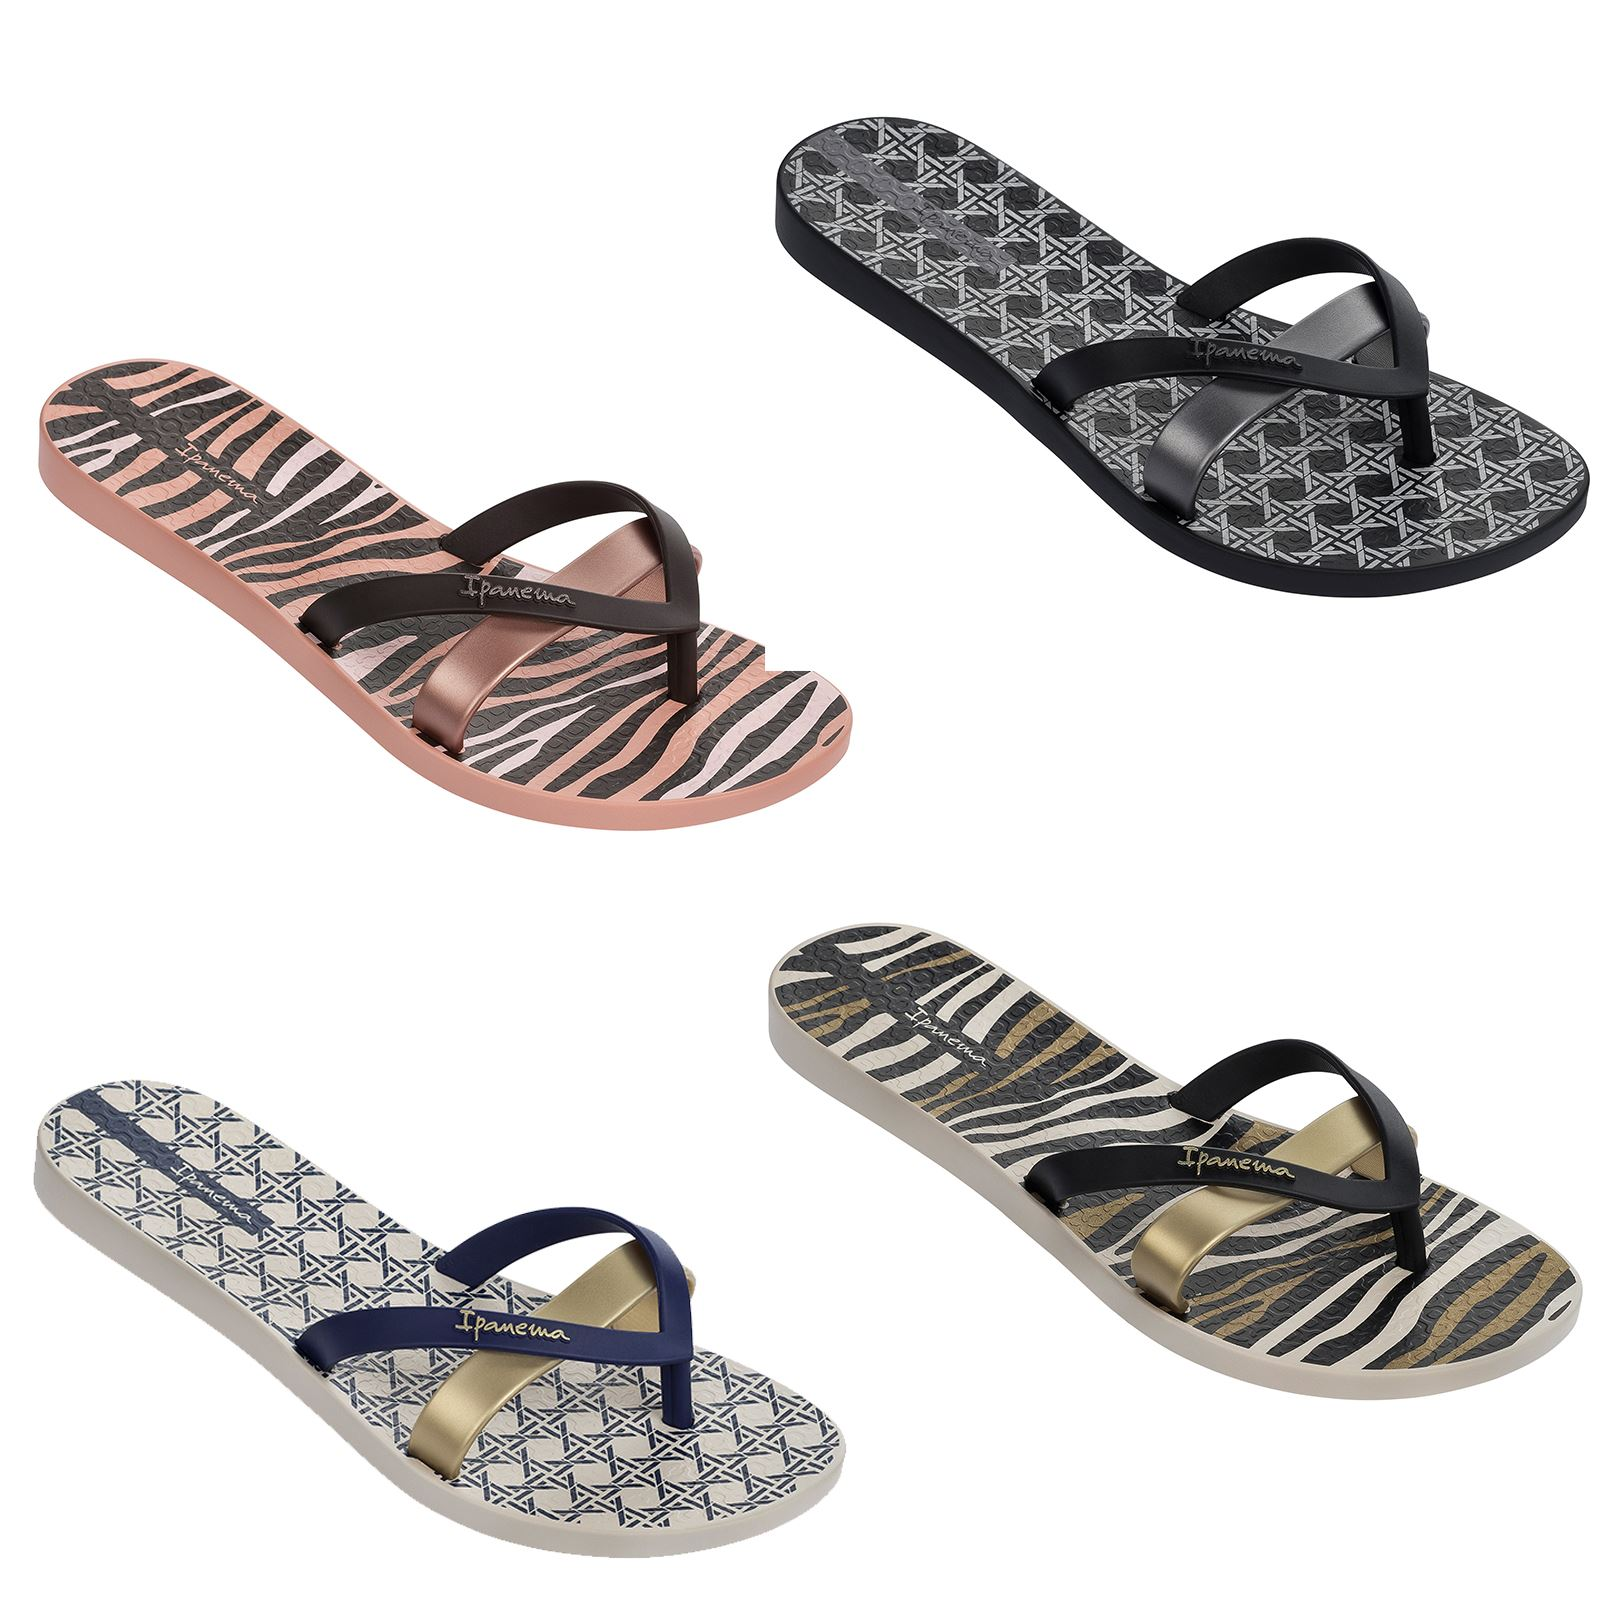 3ea3e9319d9c Ipanema Silk II Flip Flops Slim Footbed Print Beach Sandals 82065